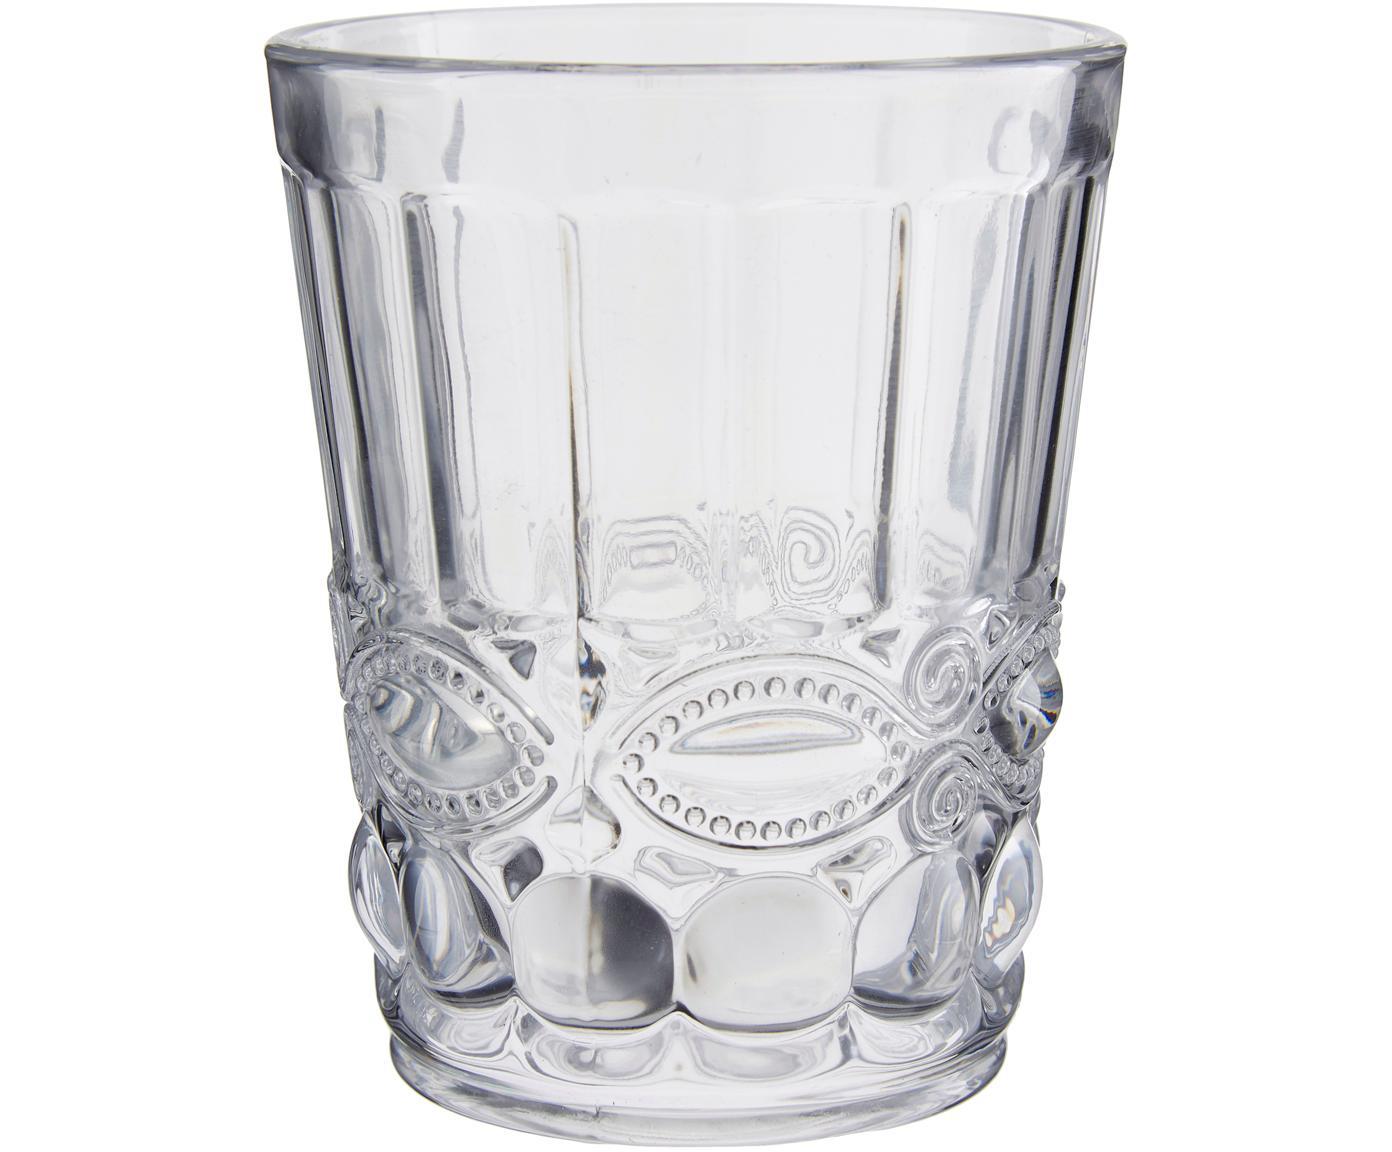 Szklanka do wody Nobilis, 6 szt., Szkło, Transparentny, Ø 9 x W 11 cm